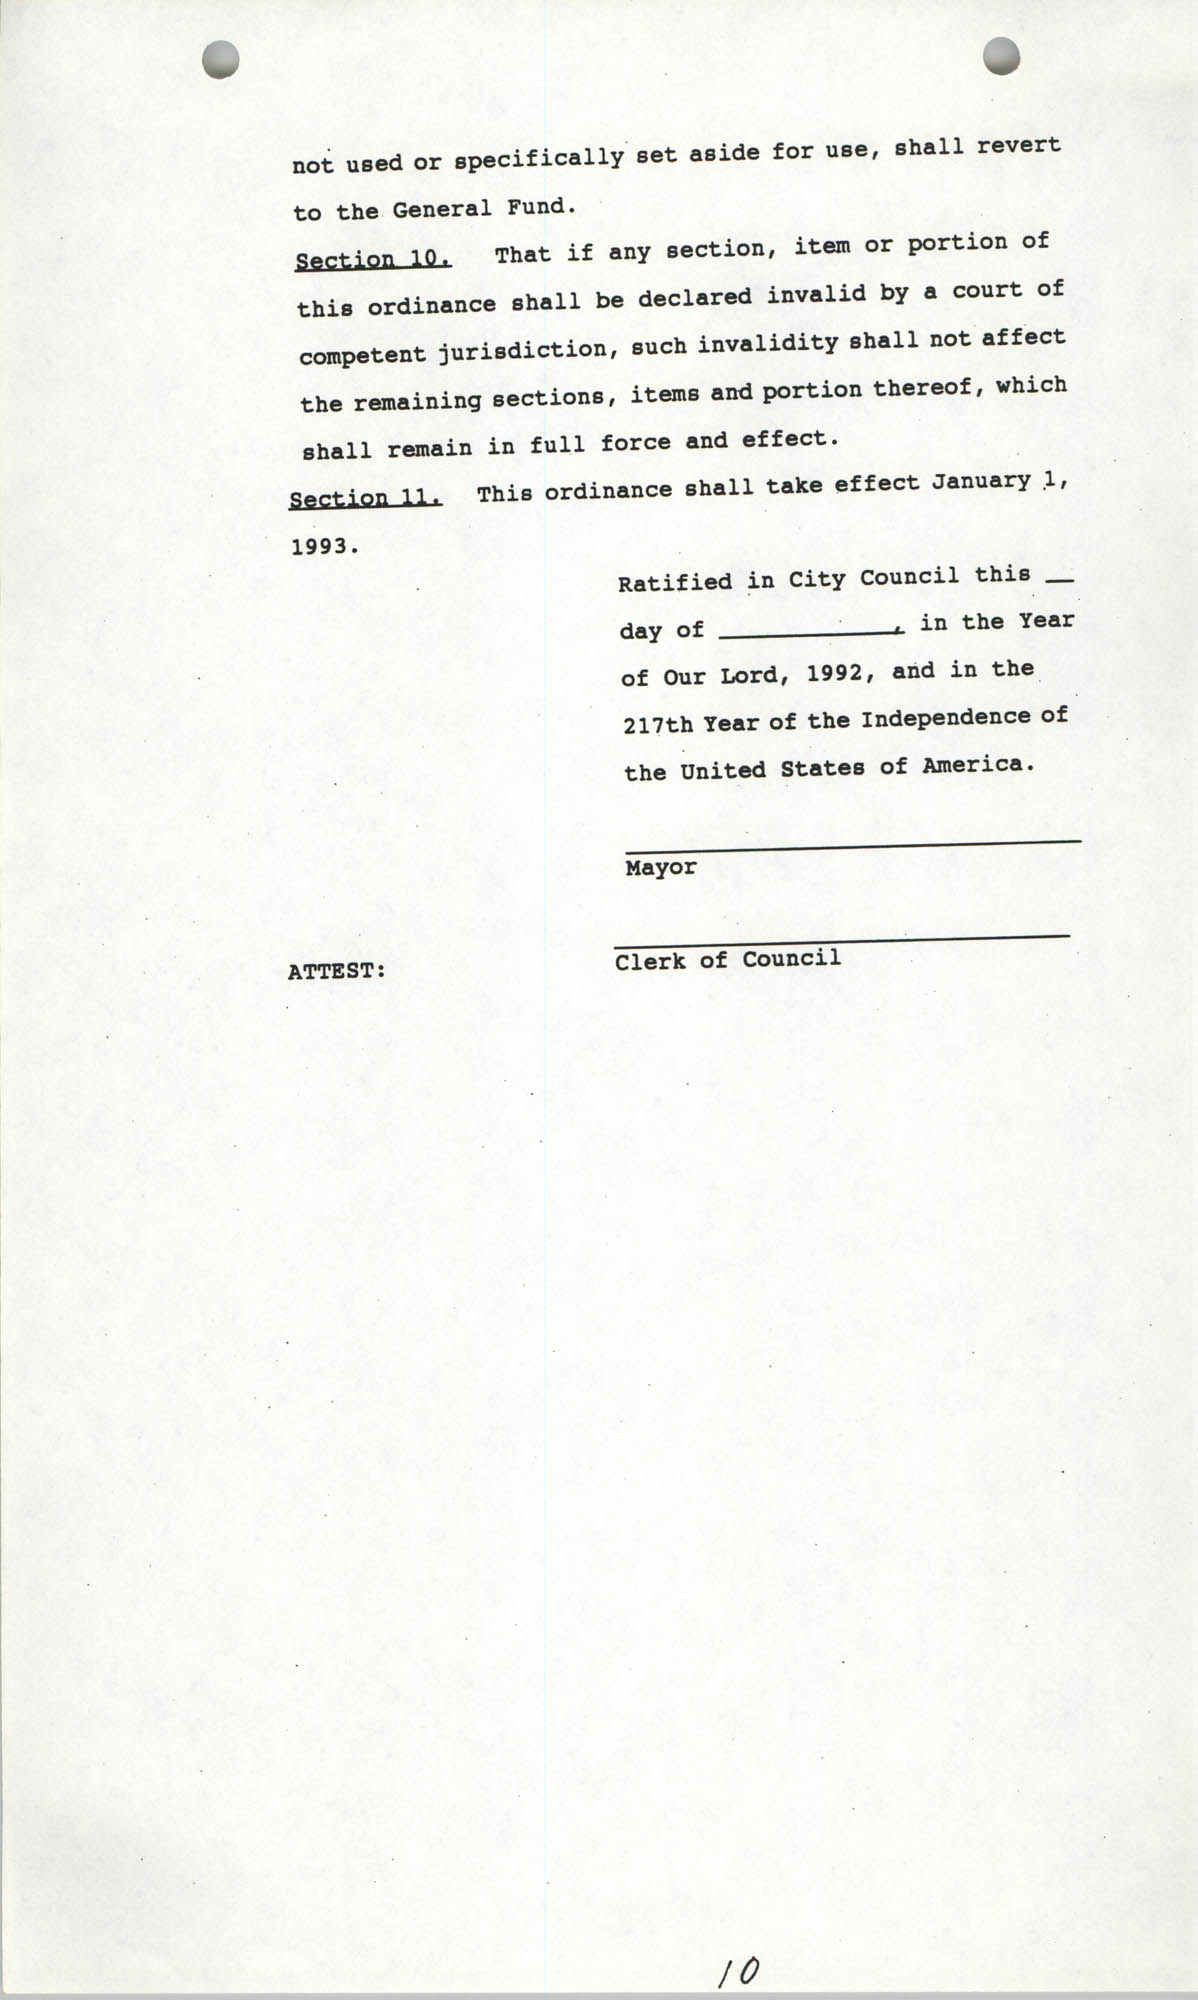 The City Council of Charleston, South Carolina, 1993 Budget, Page 10